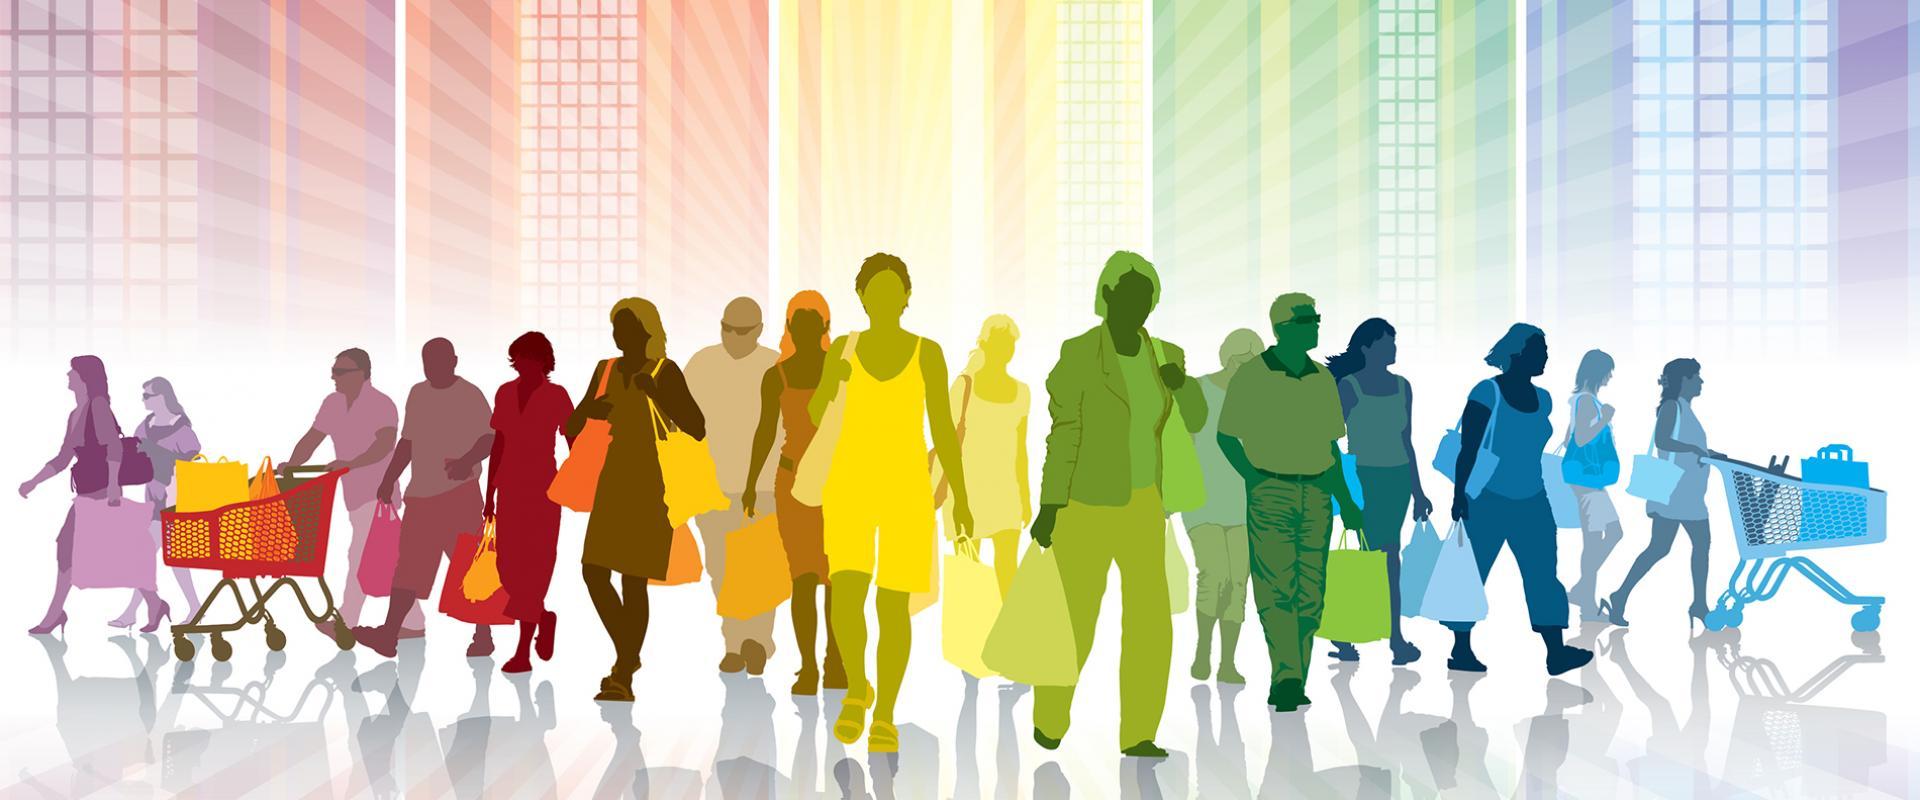 Retail latinoamericano 1 - Panorama, expectativa y cambios en el retail latinoamericano